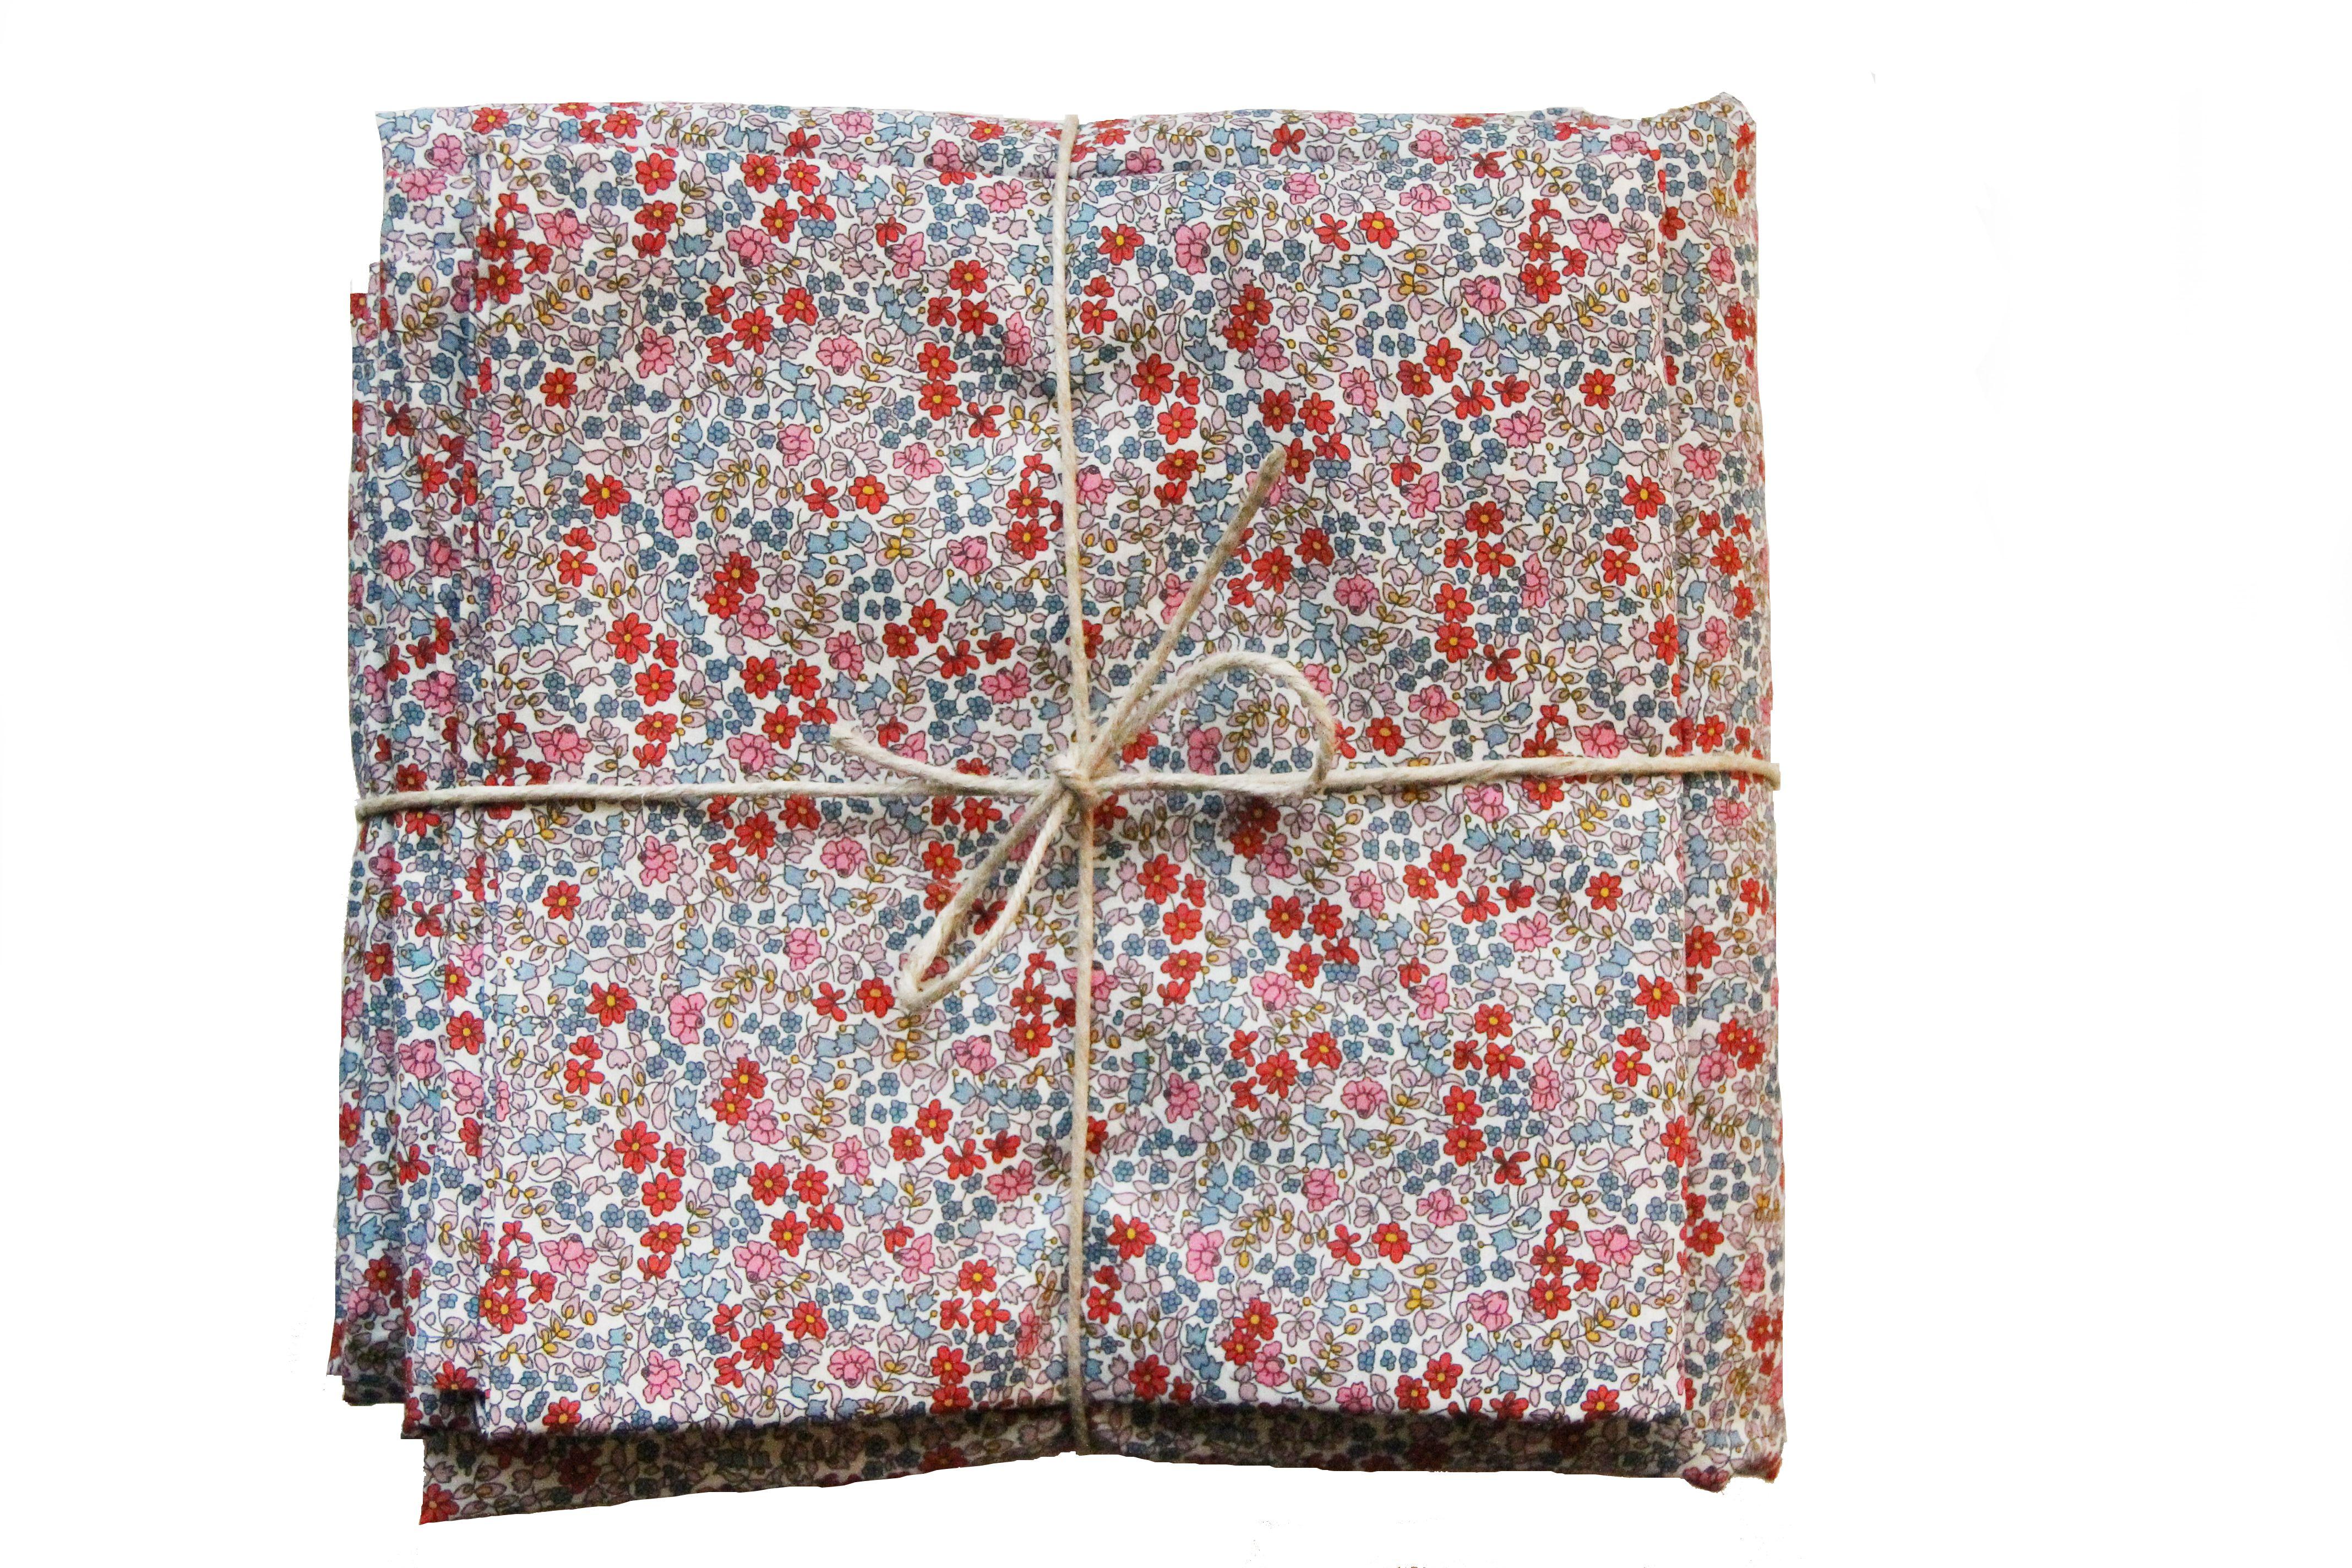 linge de lit enfant liberty Liberty of London Bed linen set http://.grassematinee.fr | For  linge de lit enfant liberty